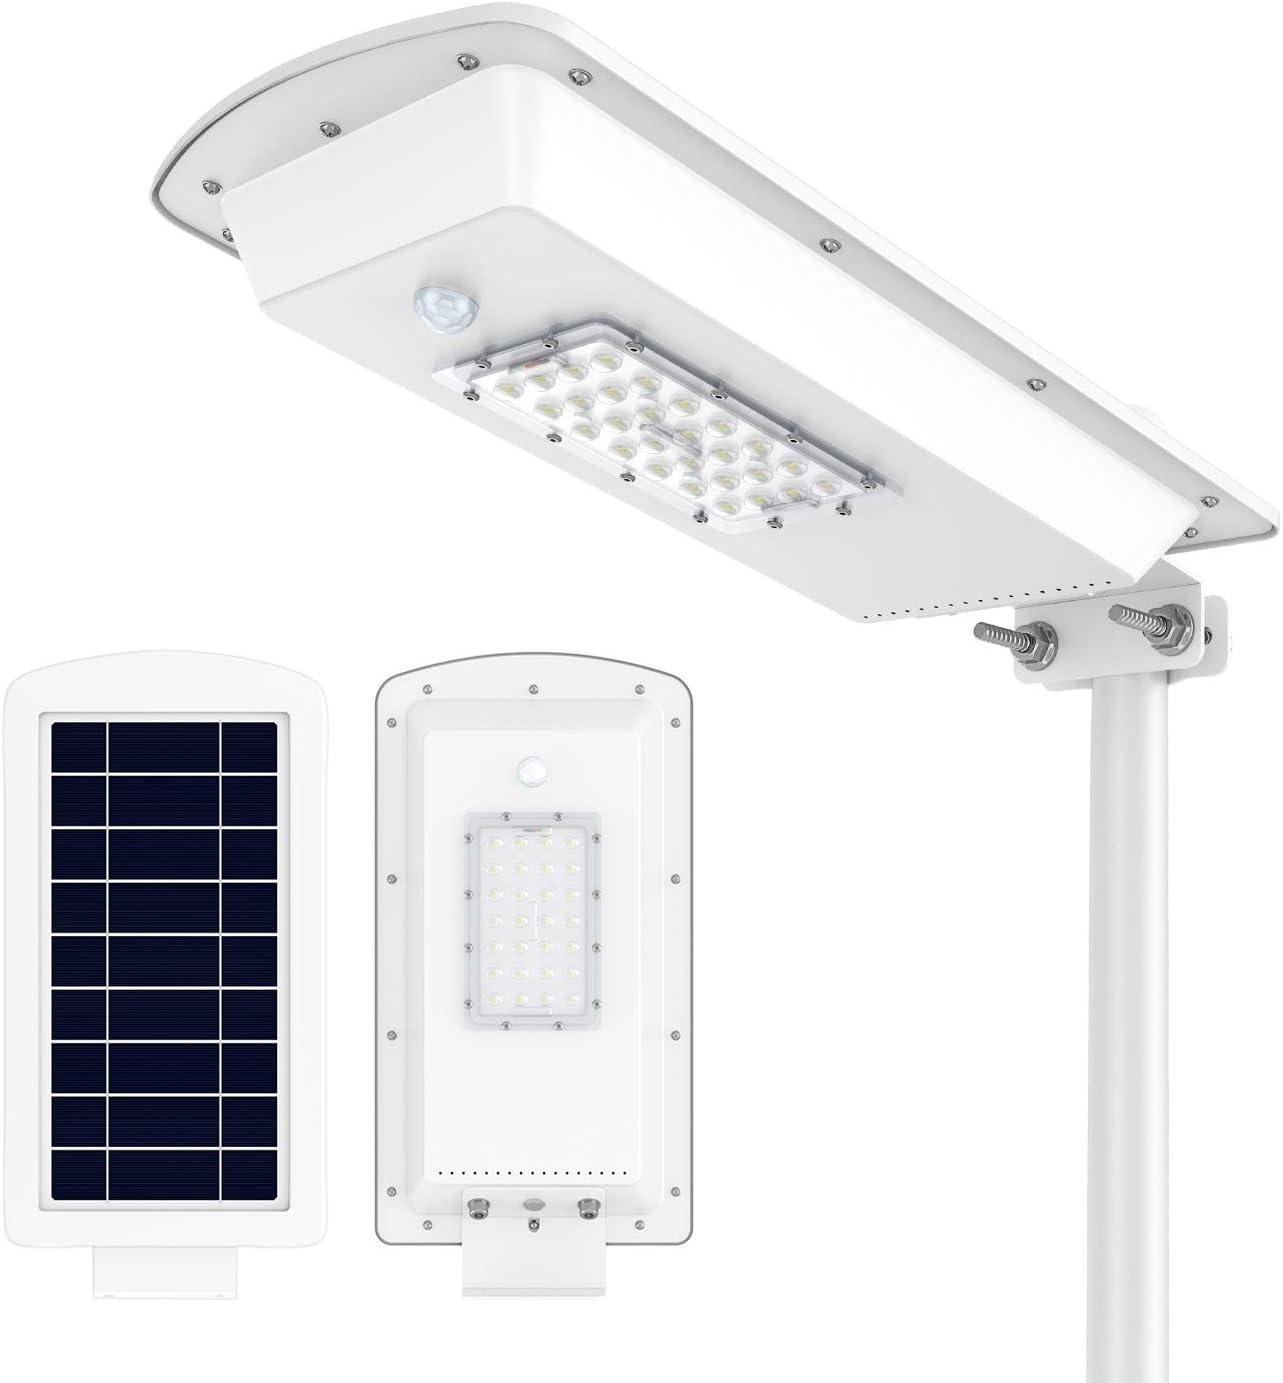 TENKOO LED Solar Street Light Wall Garden Lights, 15W All in One with Motion Sensor Waterproof IP65 Super Bright Security Solar Light Outdoor for Street Gutter Patio Garden Path